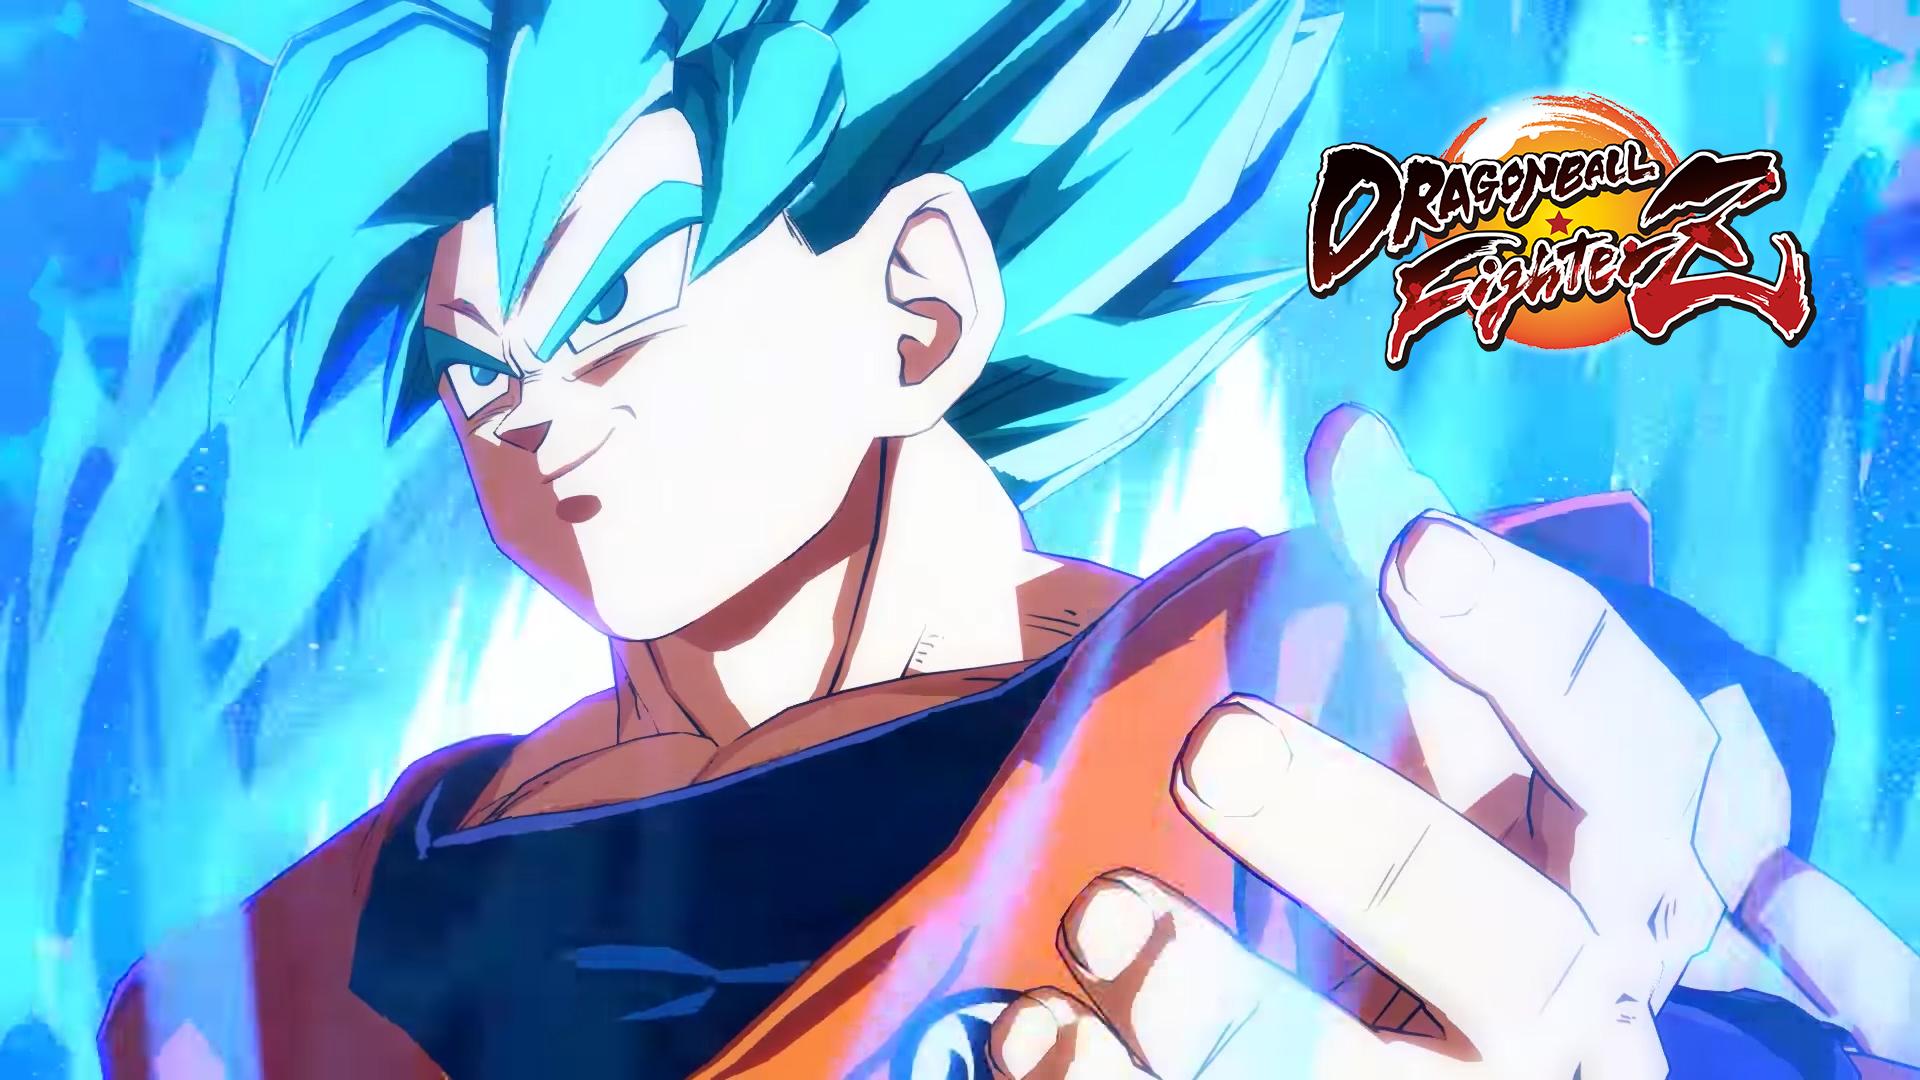 Dragonball Fighterz Ssjb Goku Wallpaper Ps4wallpapers Com